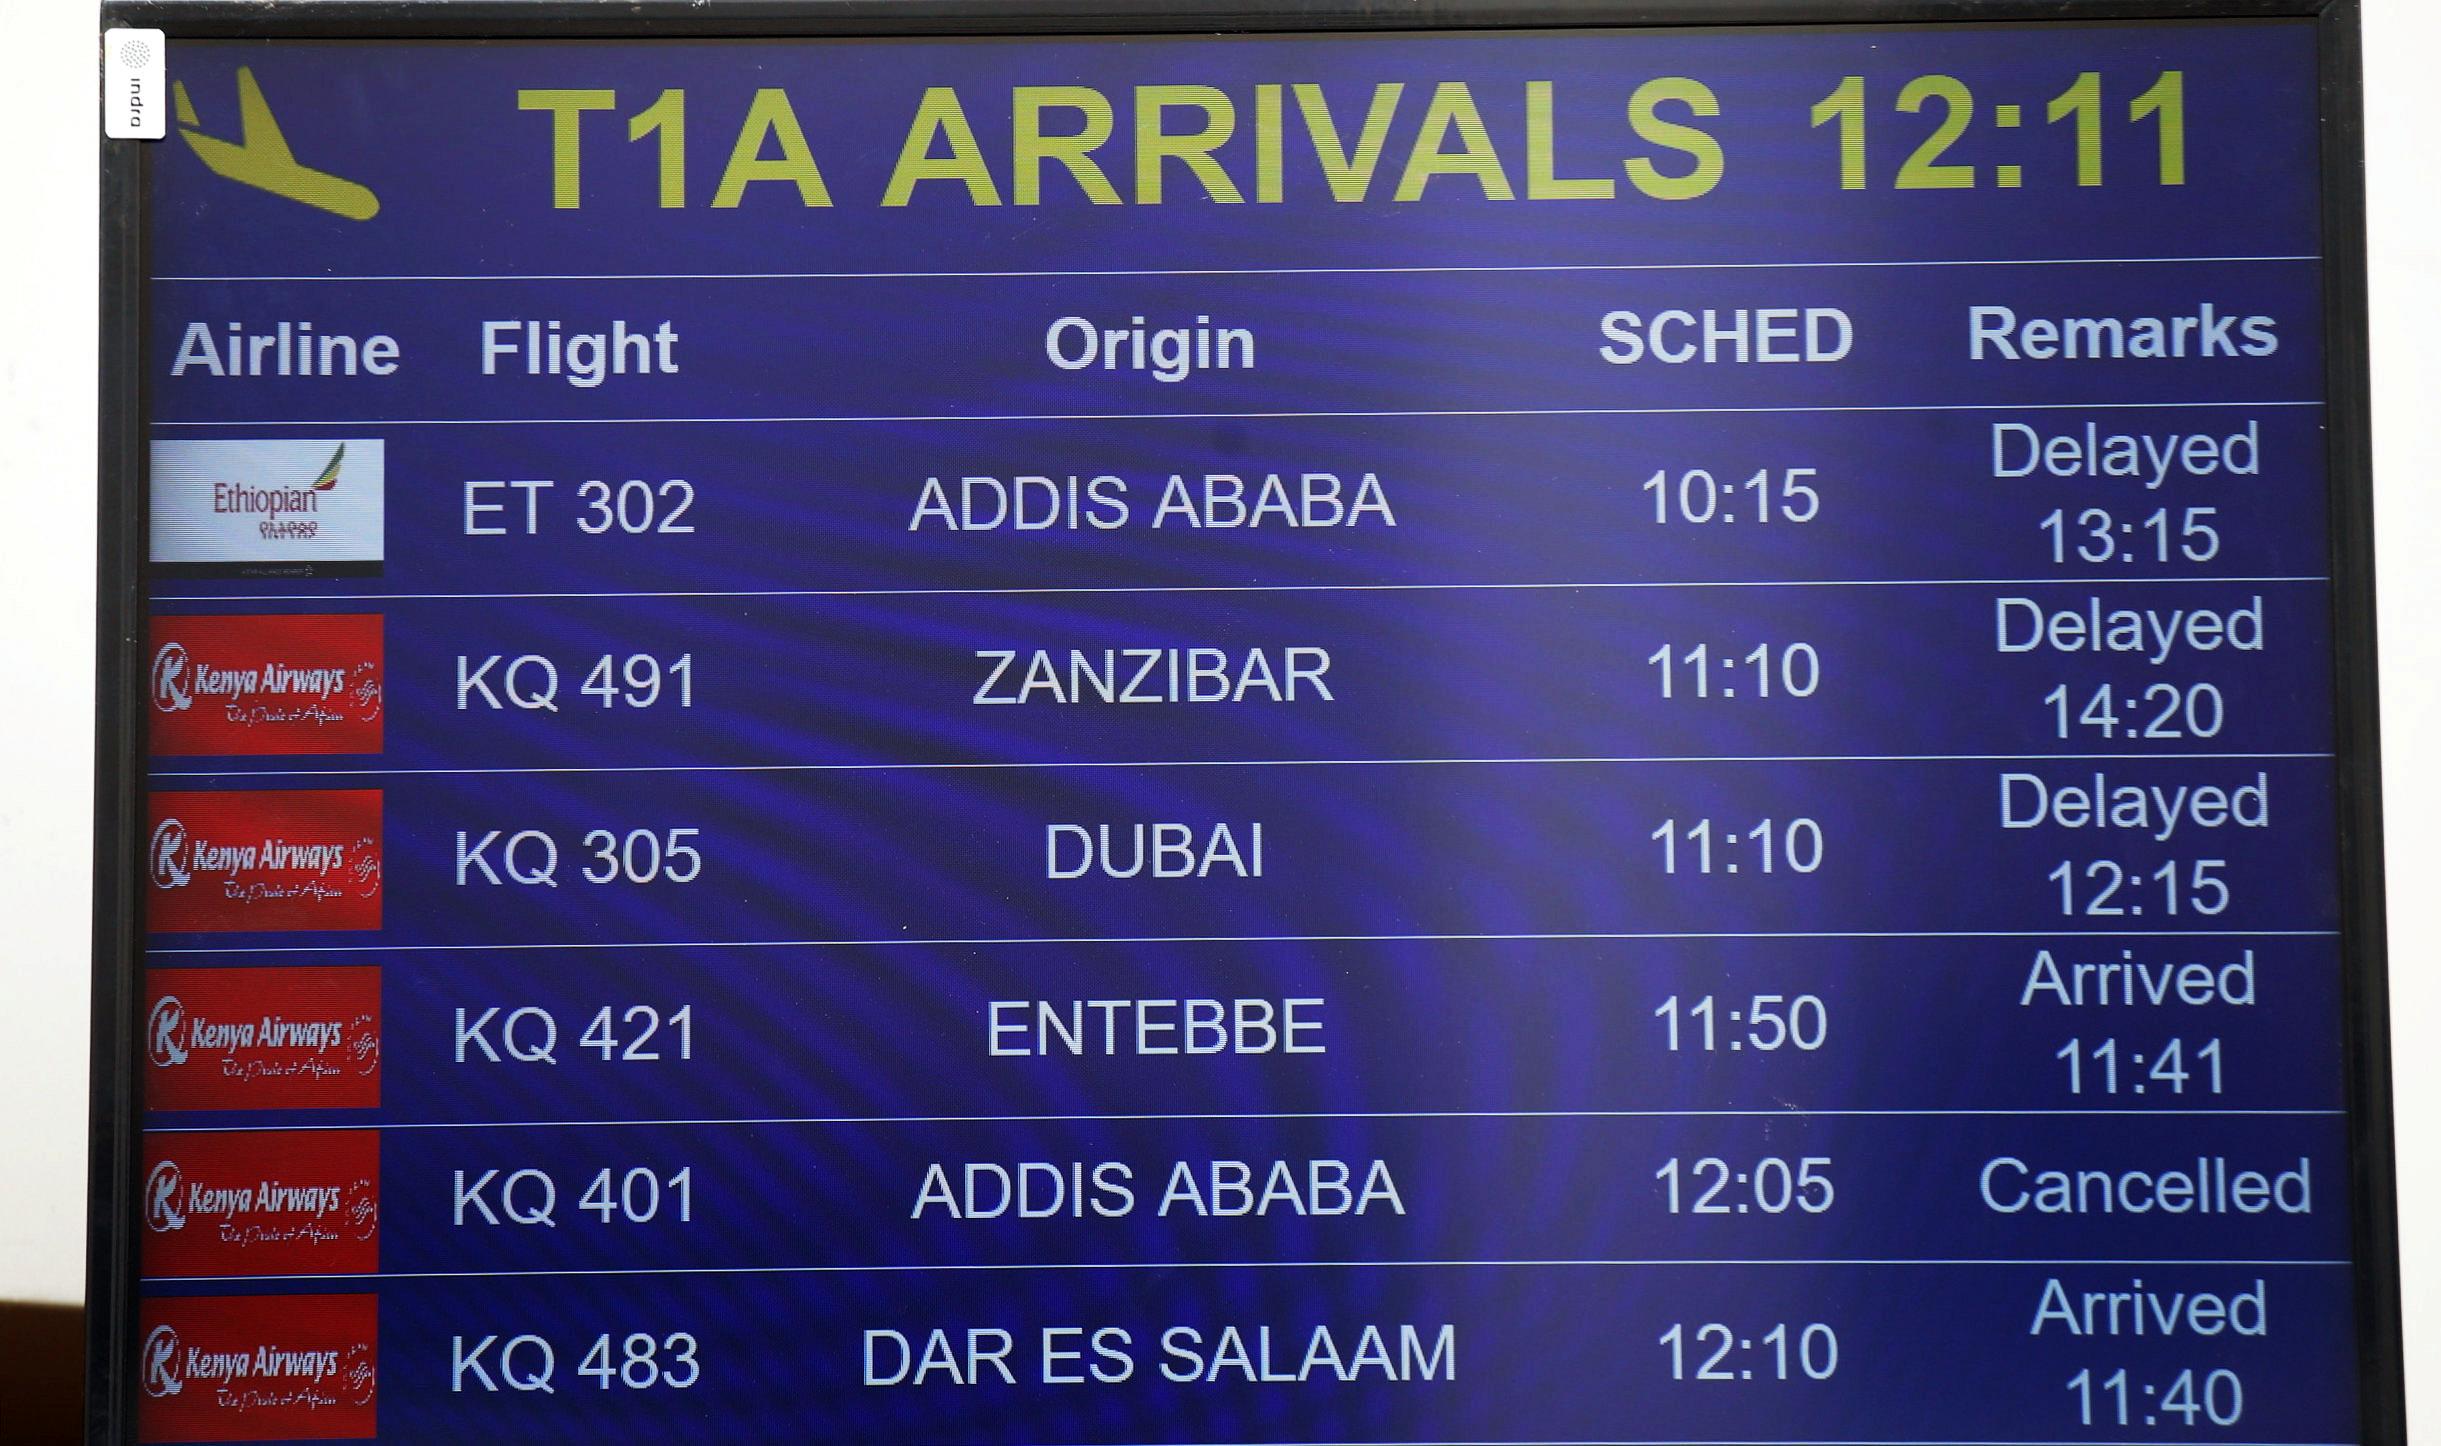 A flight information board displaying the details of Ethiopian Airlines Flight ET 302 is seen at the Jomo Kenyatta International Airport (JKIA) in Nairobi, Kenya March 10, 2019.